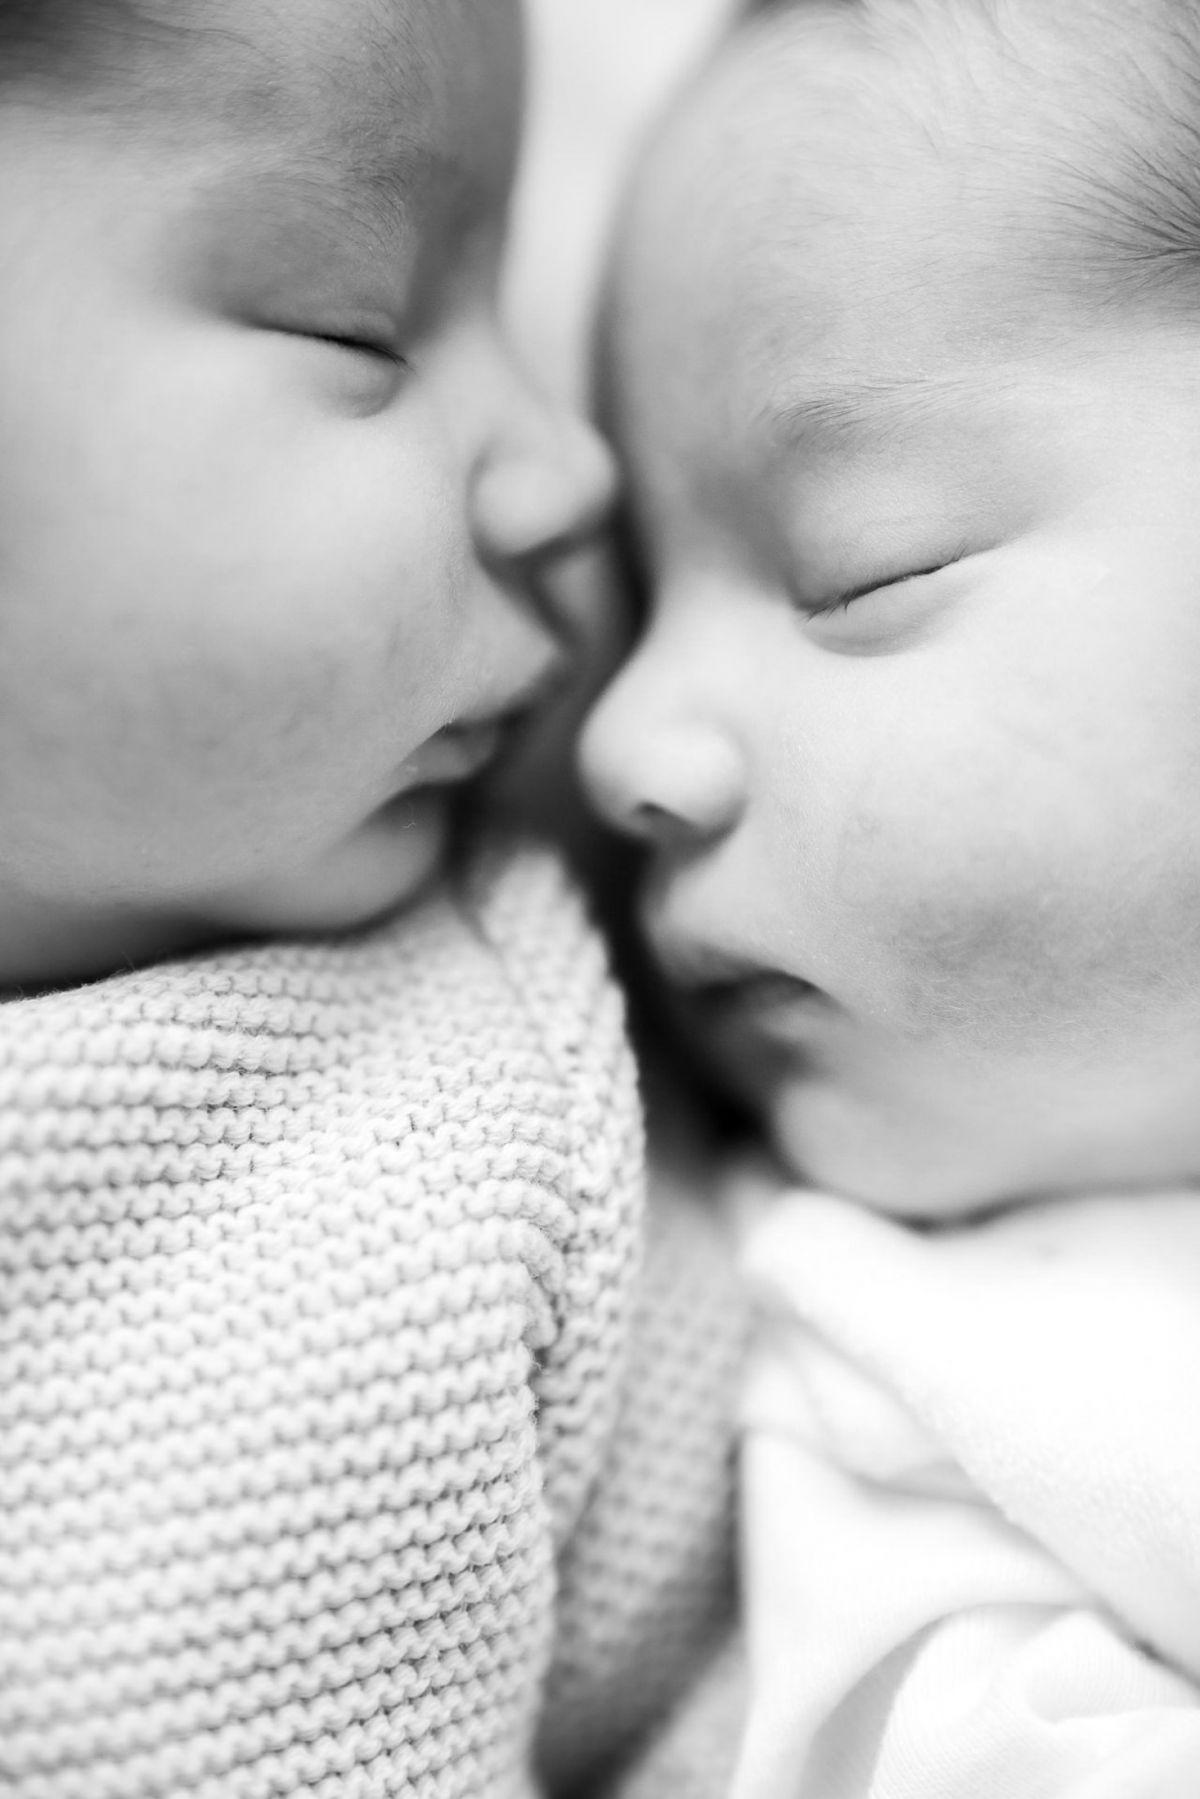 photographe bébé nanterre 92